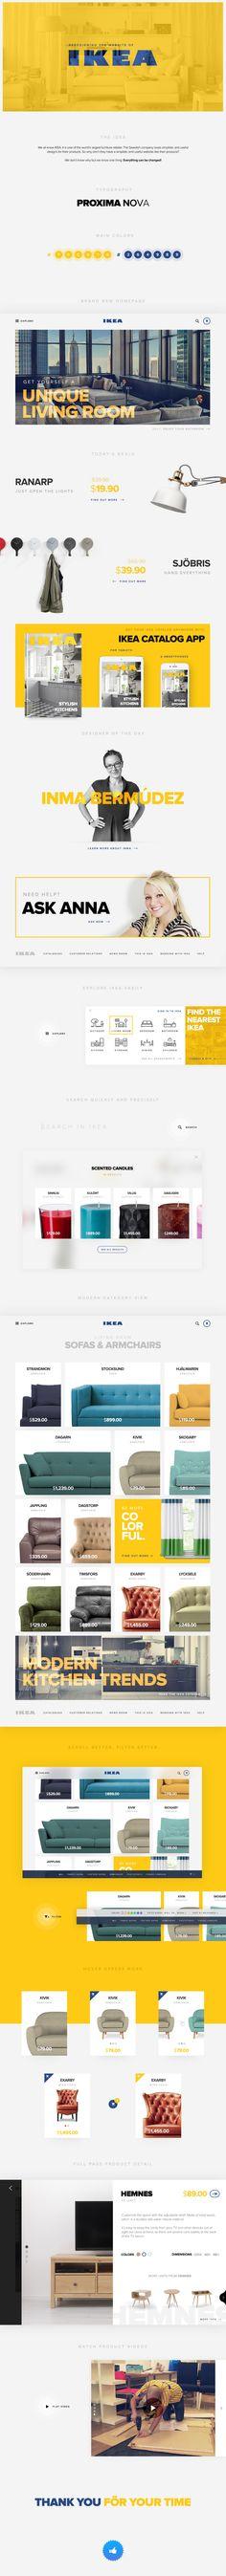 IKEA Redesign - UI & UX Design https://www.behance.net/gallery/28015103/IKEA-Redesign-UI-UX-Design